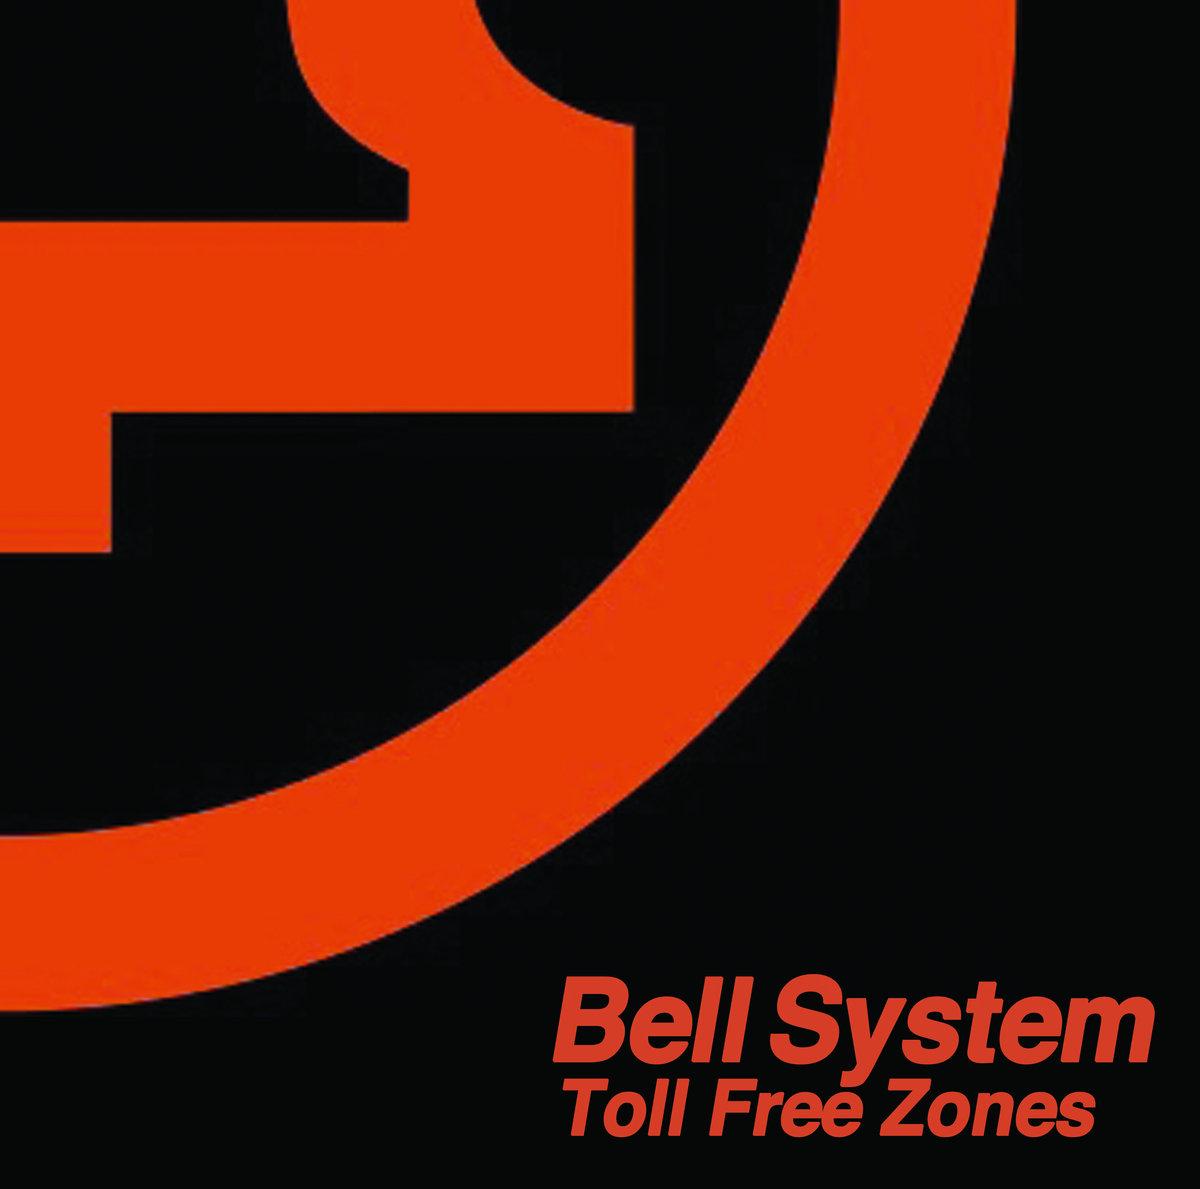 toll free zones or basic billing plan gap dream